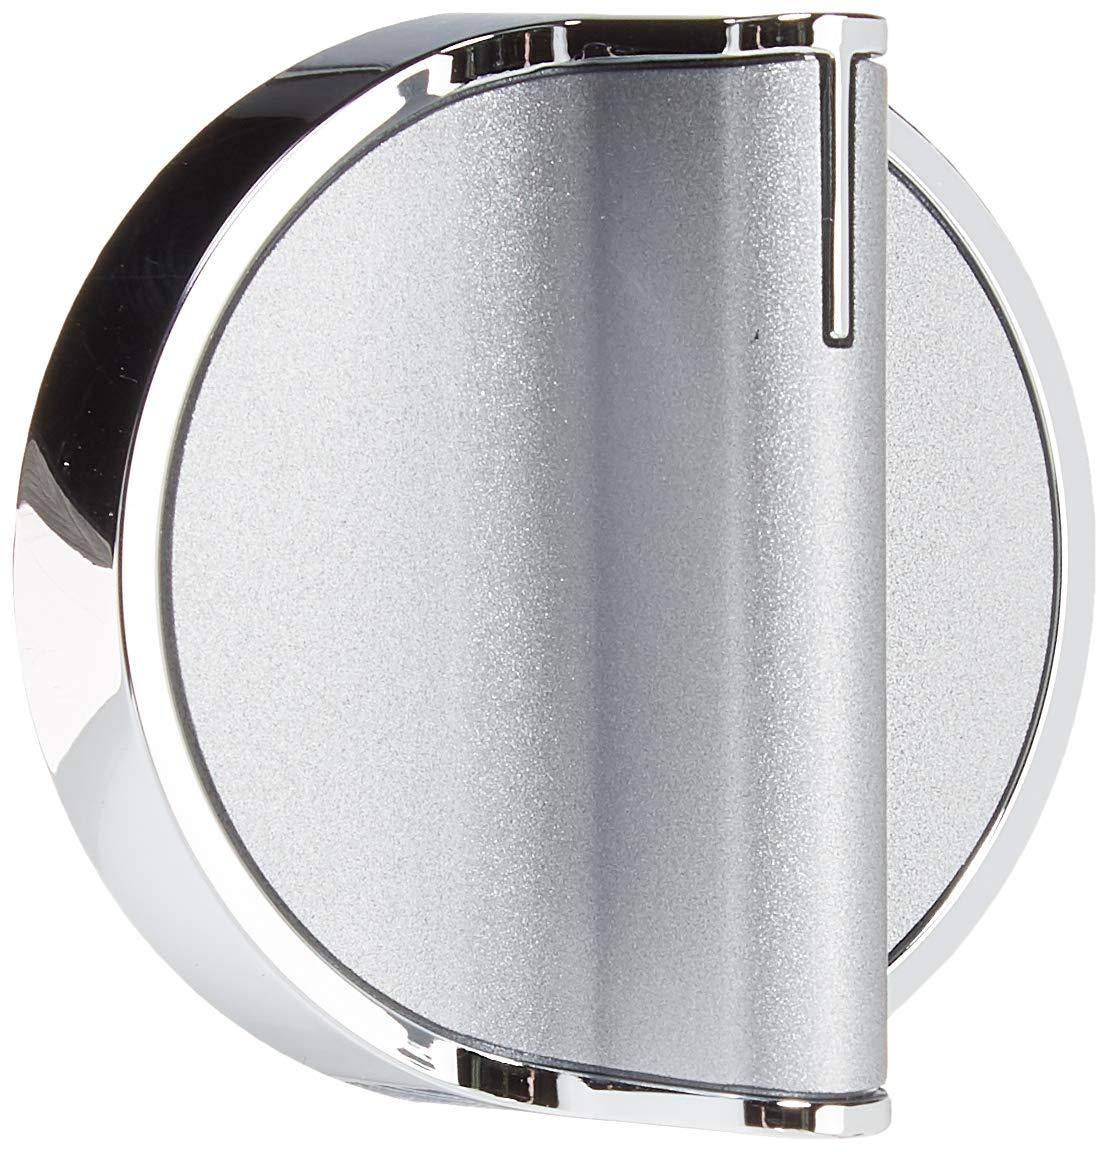 B001AGI4JW Whirlpool W10594481 Control Knob 71xDZGcNSmL